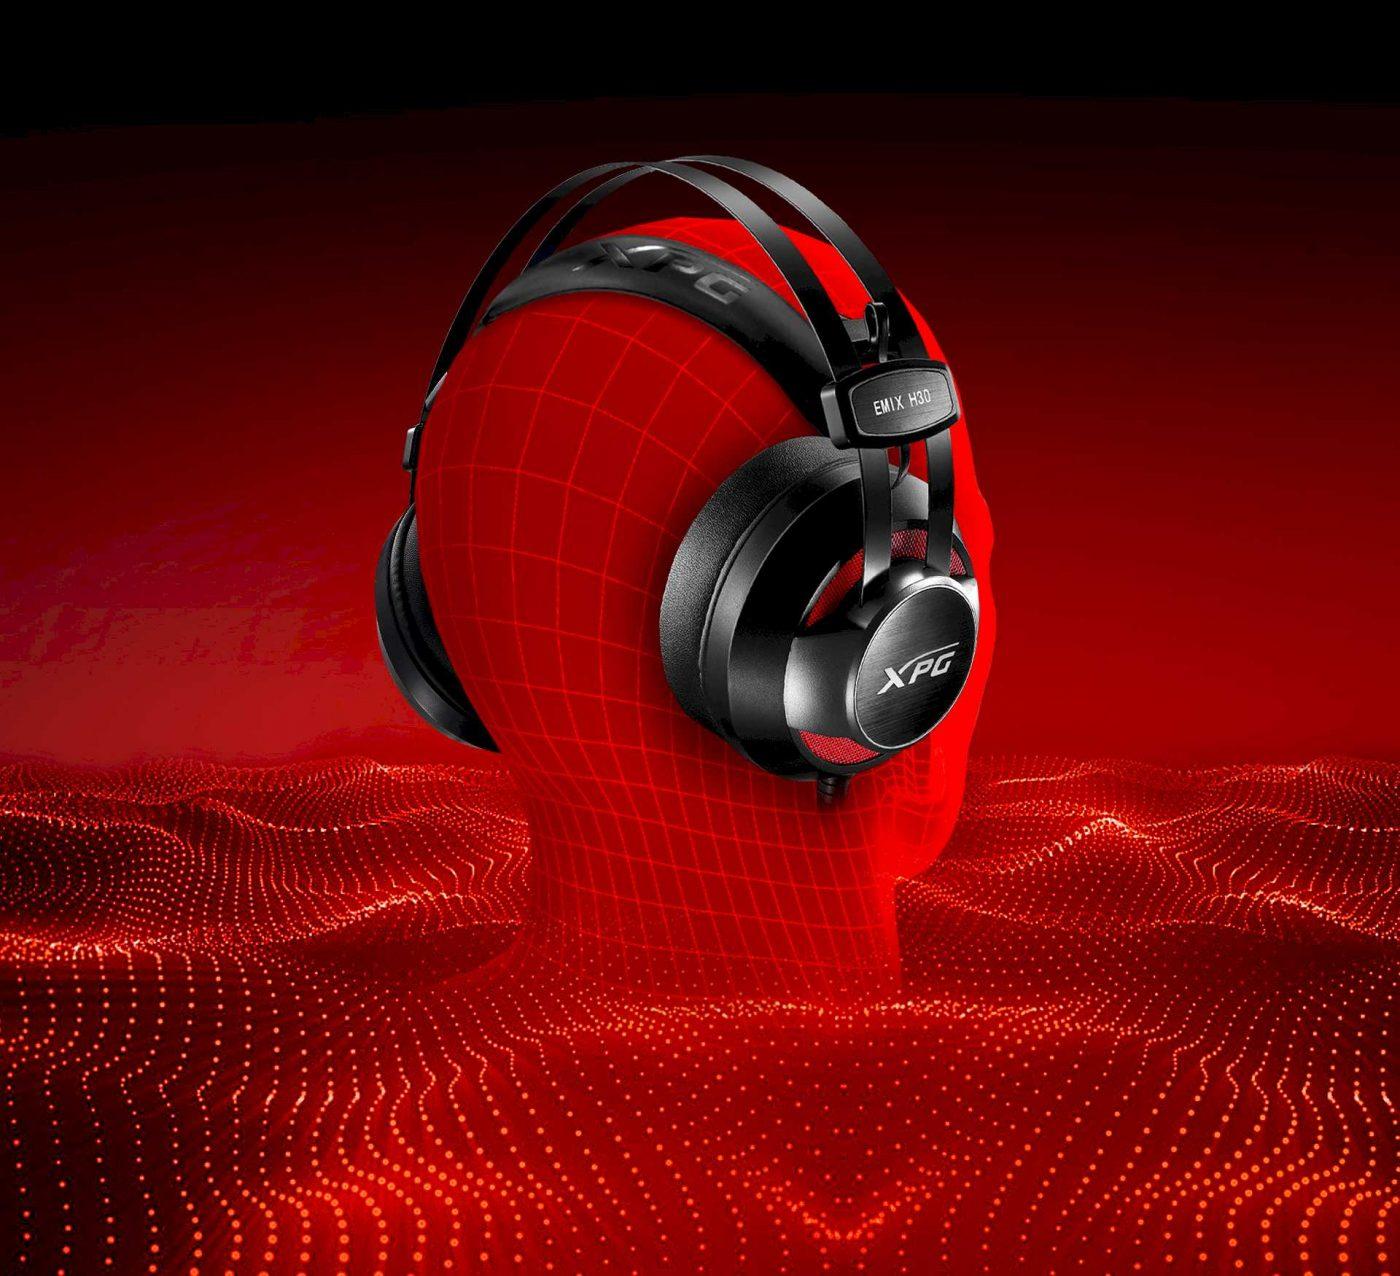 headset xpg emix h30 solox f30 7 1 von adata dgh. Black Bedroom Furniture Sets. Home Design Ideas